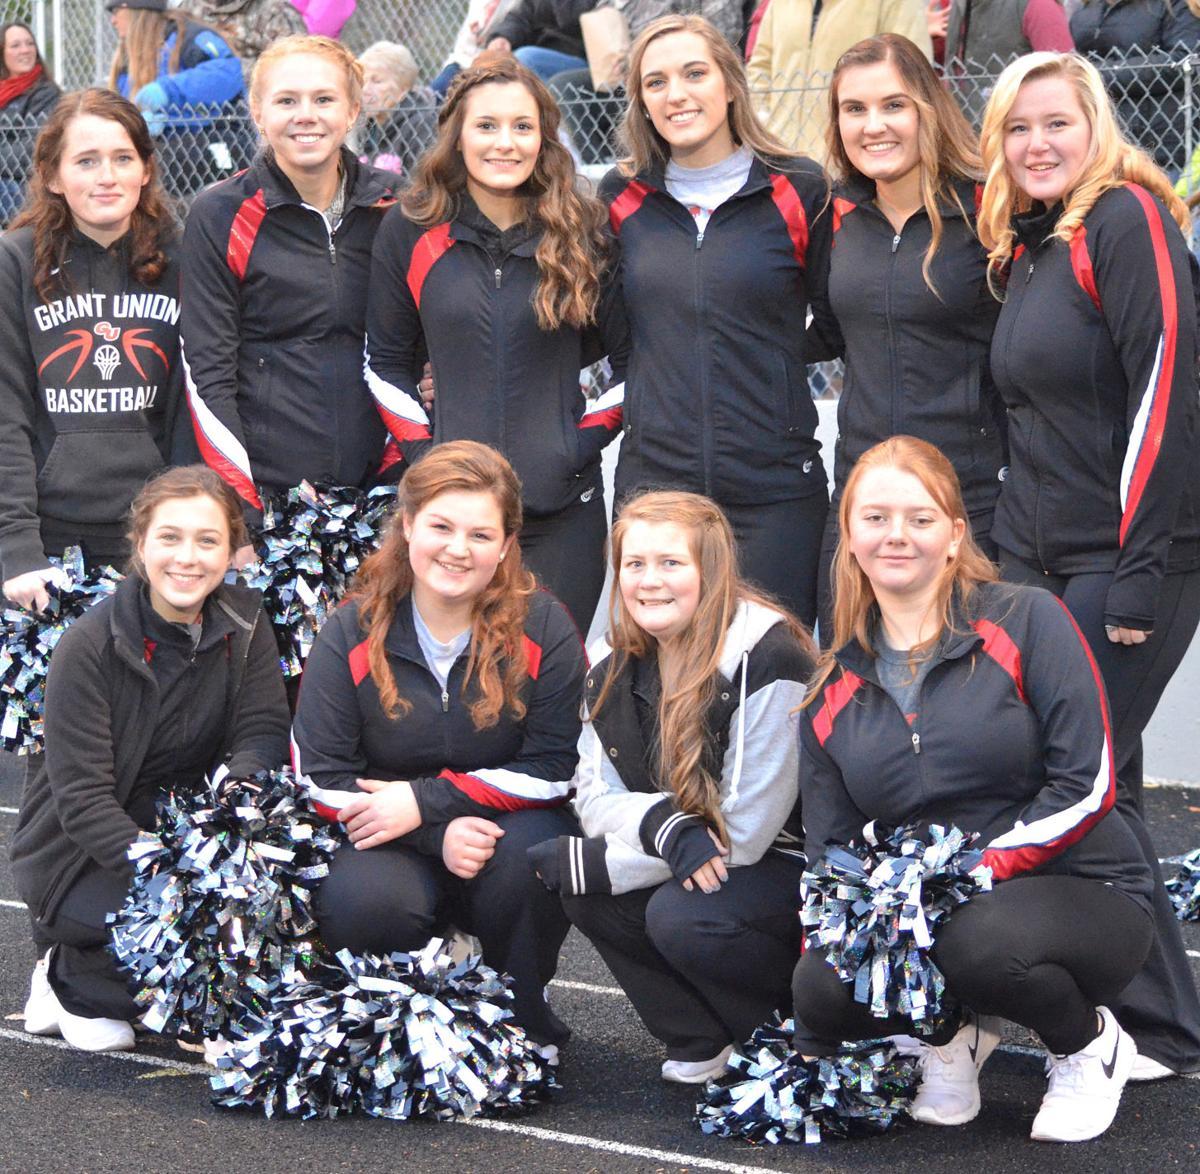 SCHOOL SPIRIT Cheerleaders rally around state contenders